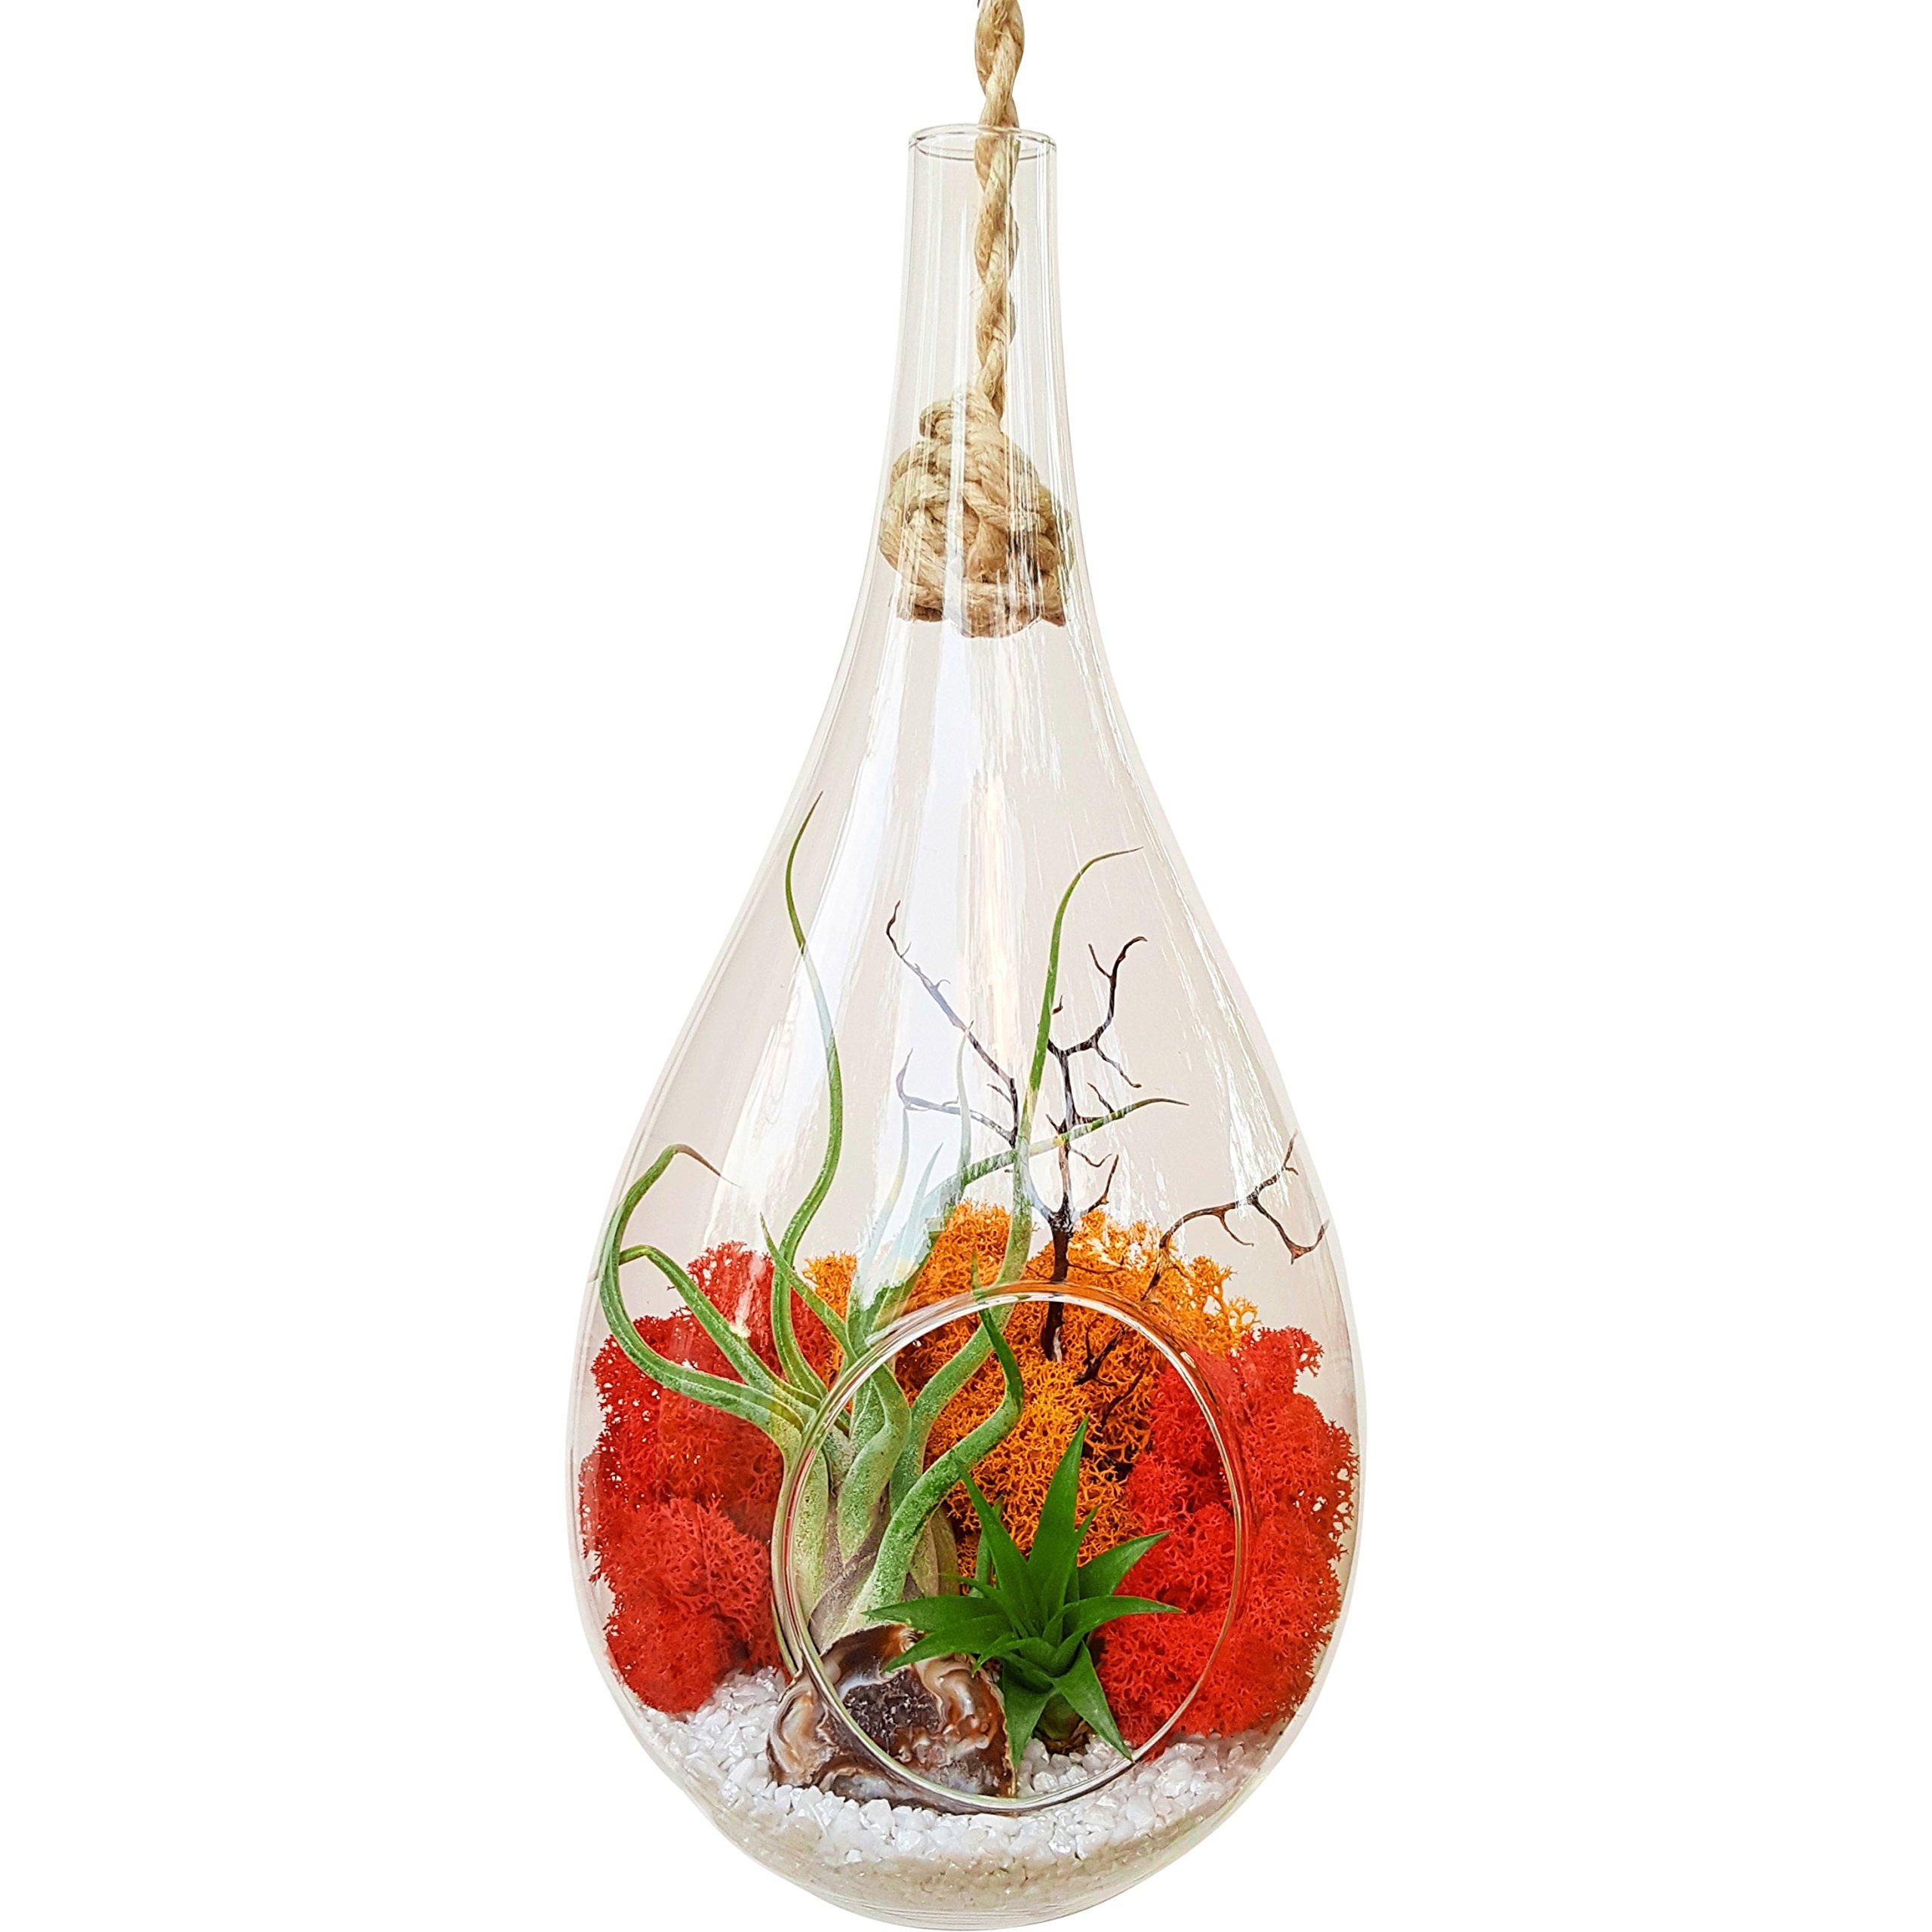 Bliss Gardens Teardrop Air Plant Terrarium Kit with Geode Half, 2 Air Plants Tillandsia / Large Hanging 13'' Glass / Sunburst On Ice